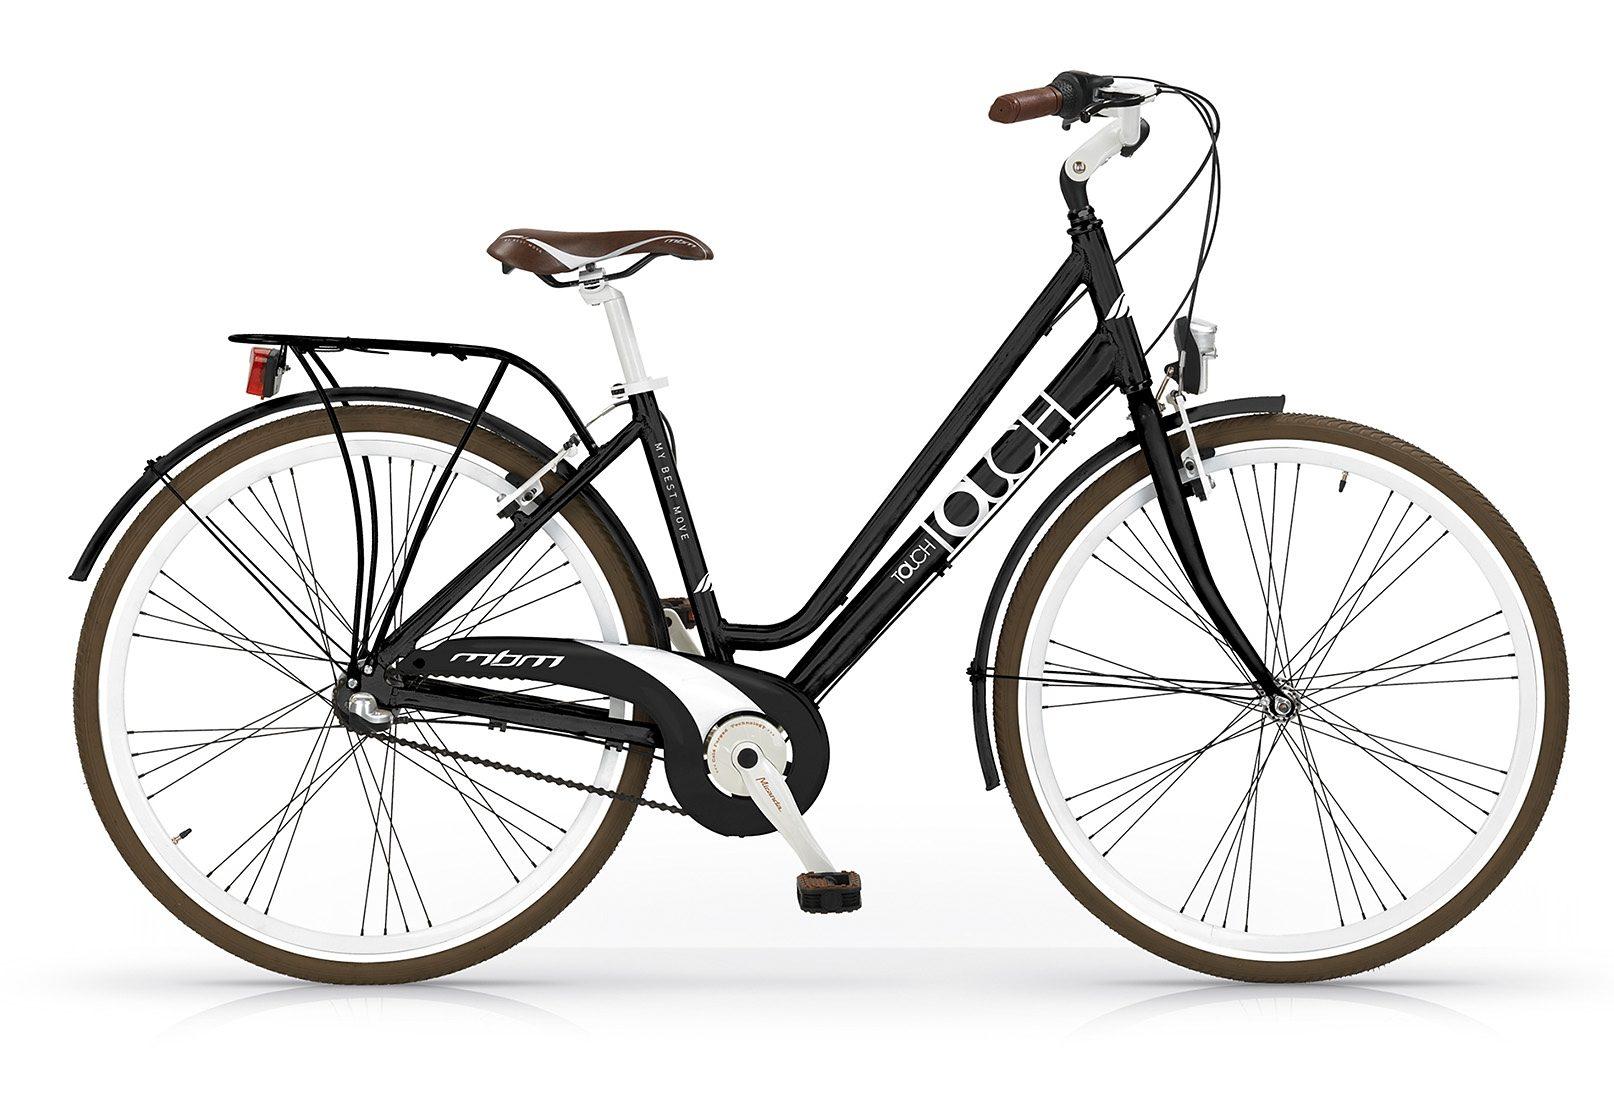 Citybike Damen, 28 Zoll, 3-Gang Nexus Freilauf, »Touch 880«, MBM